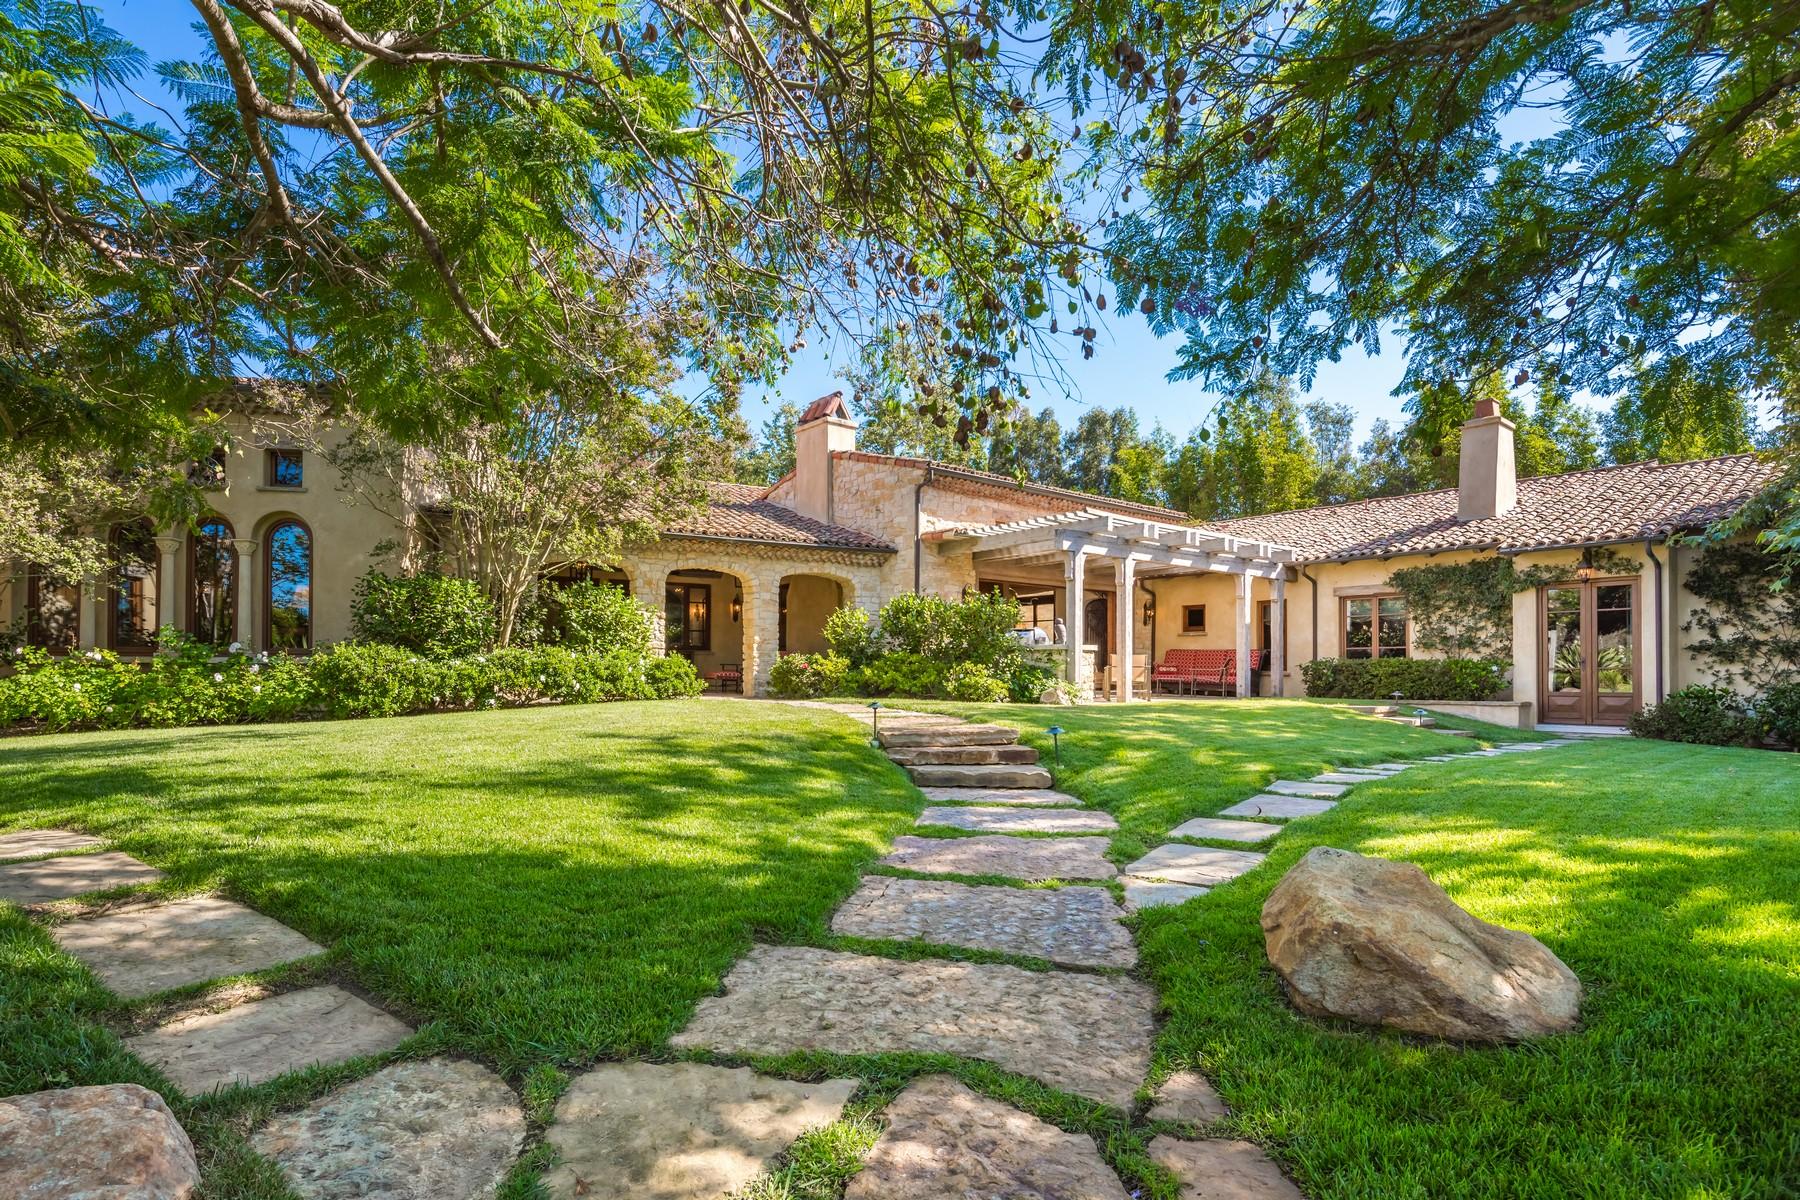 Property for Sale at 6560 La Valle Plateada Rancho Santa Fe, California 92067 United States